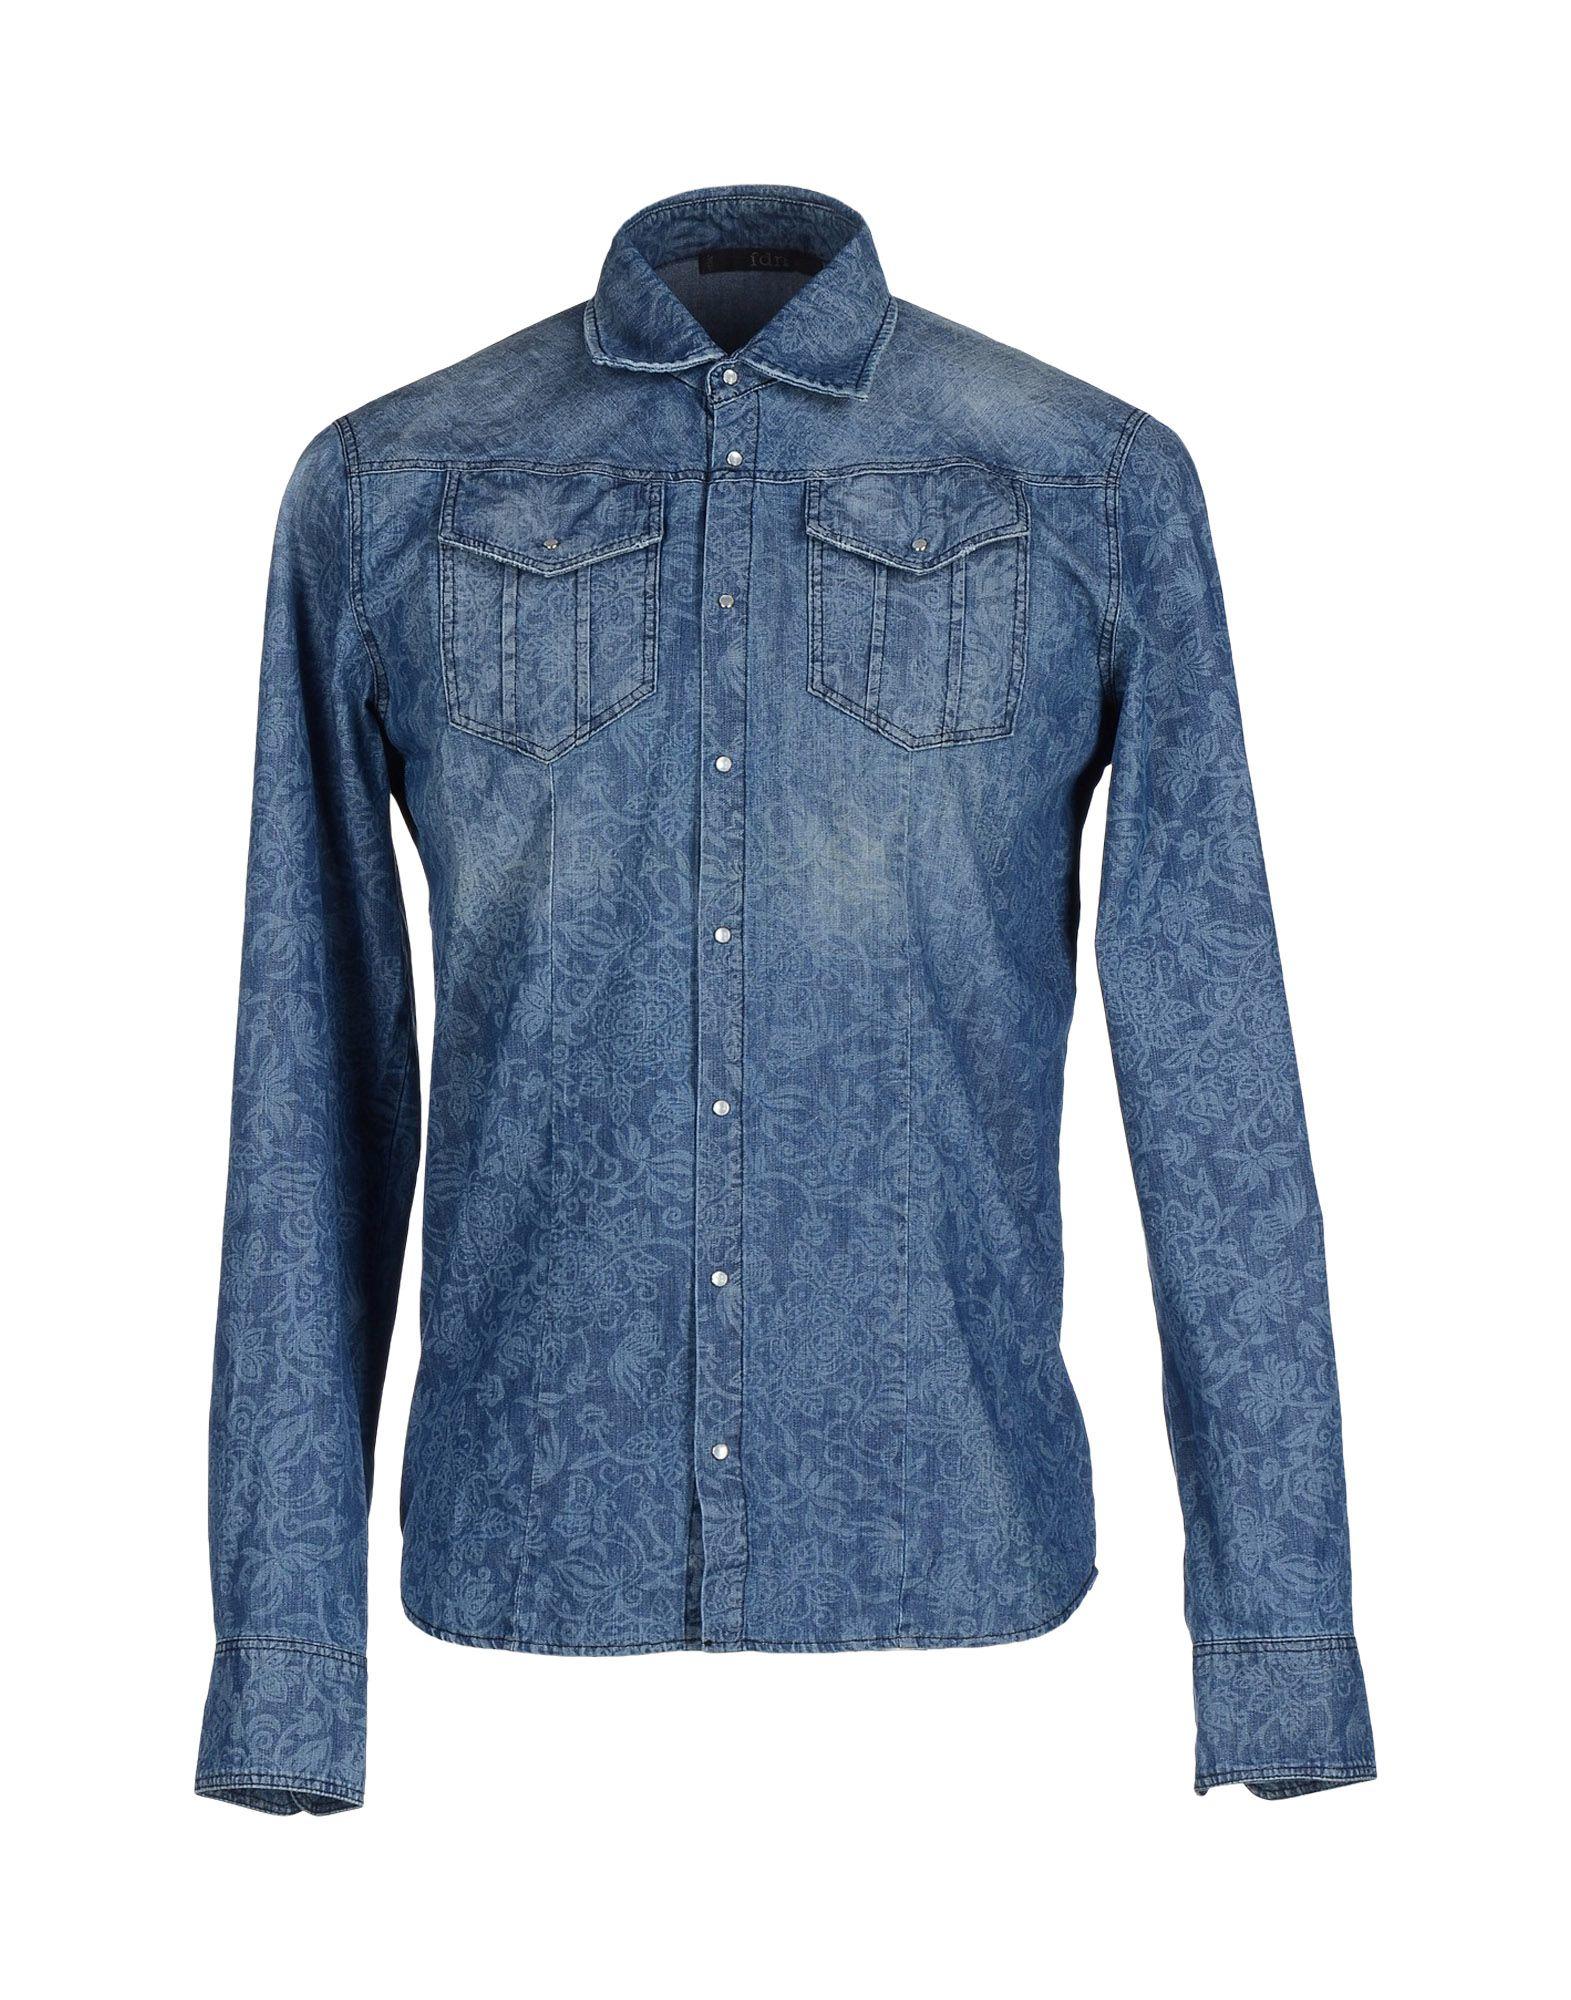 Fdn Denim Shirt In Blue For Men Lyst